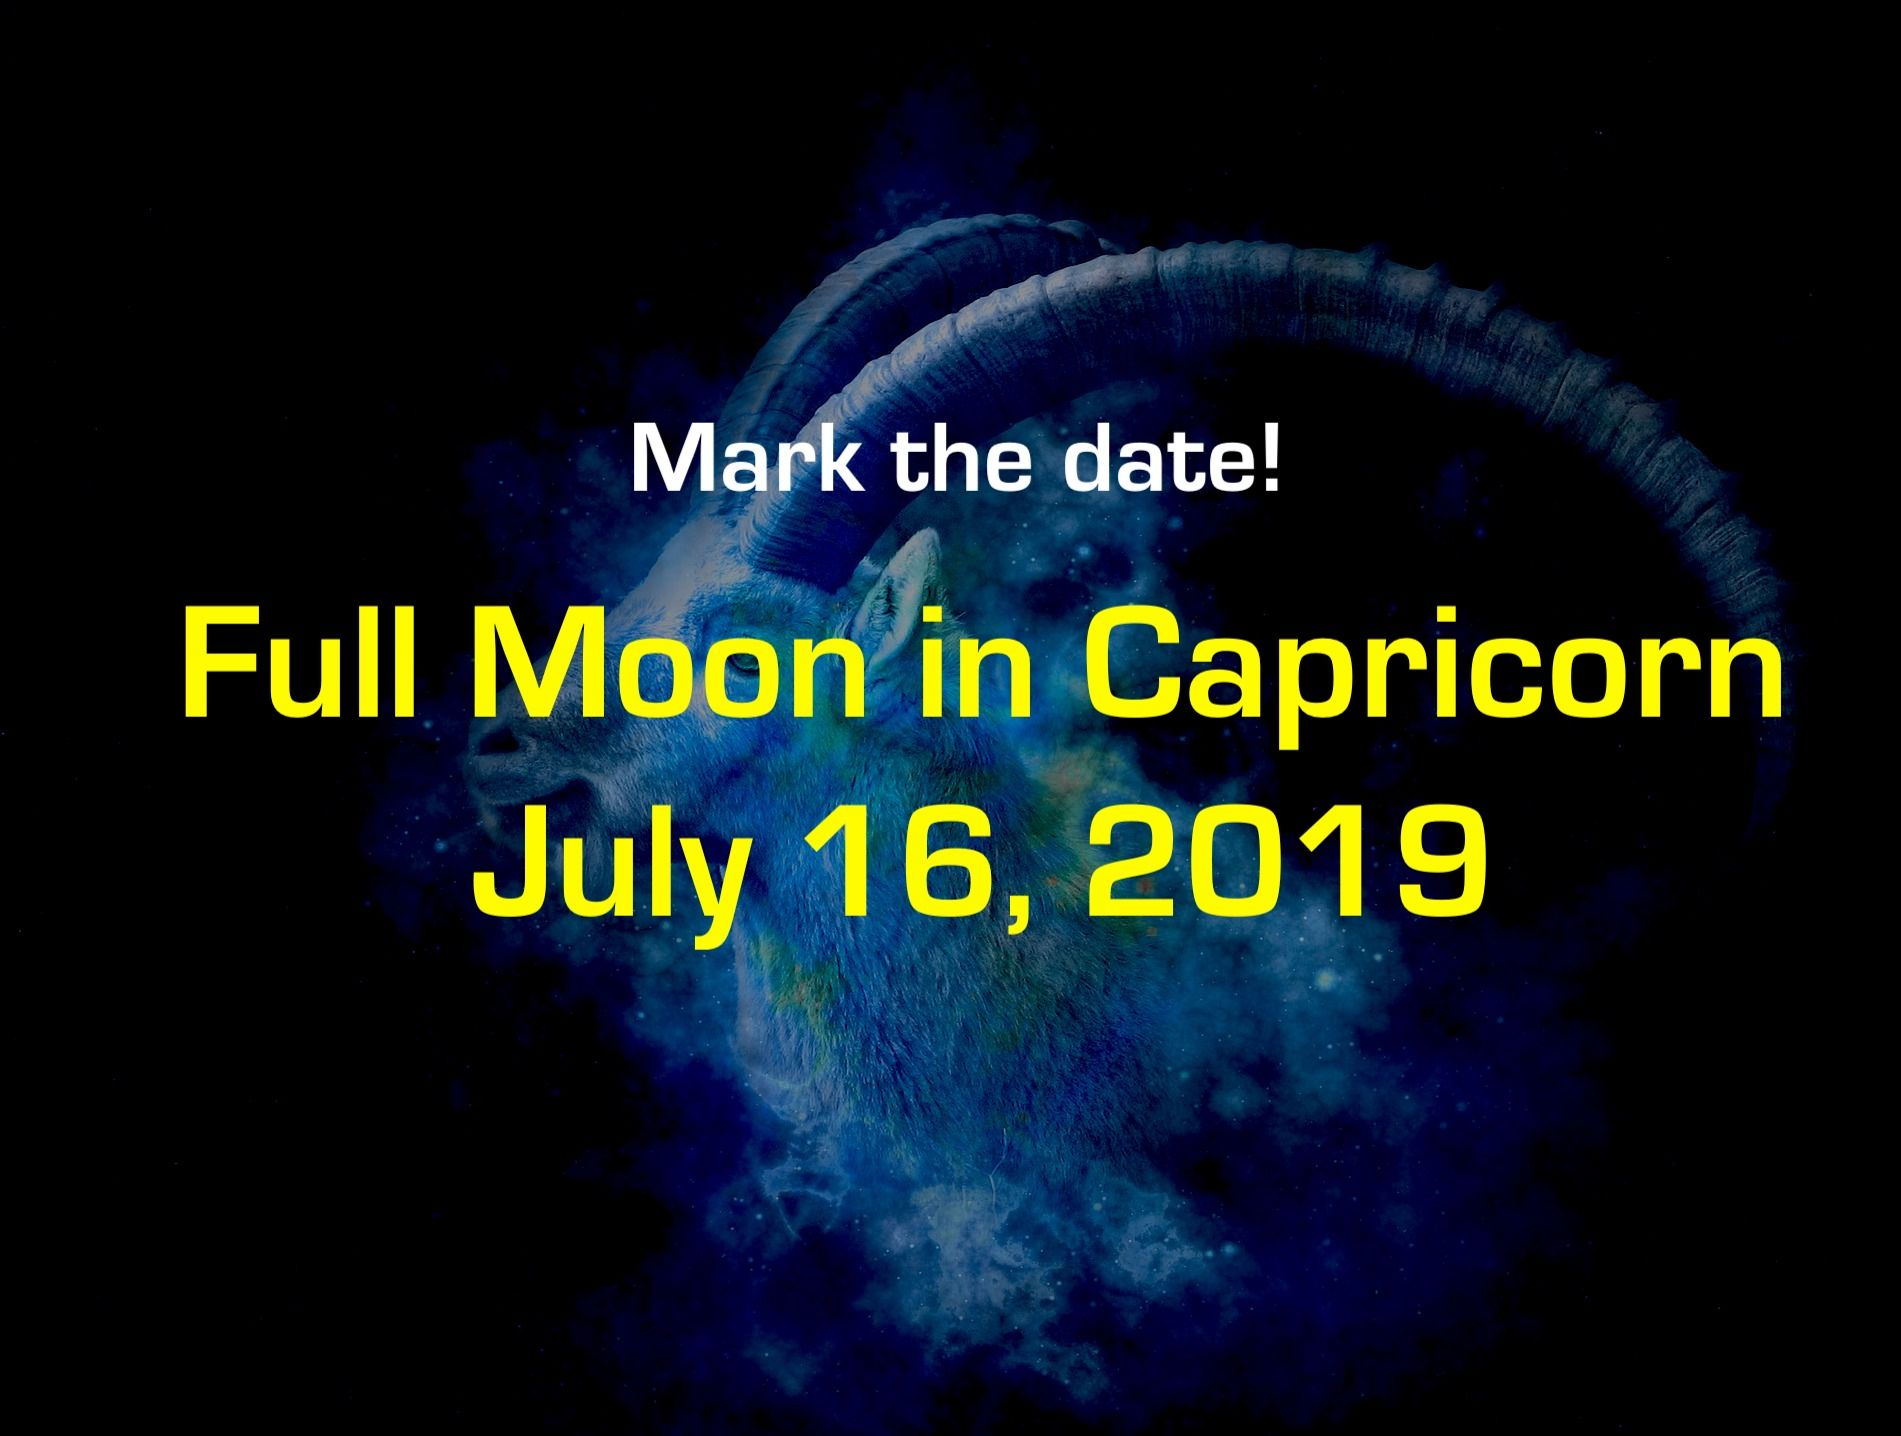 Full Moon In Capricorn July 16, 2019